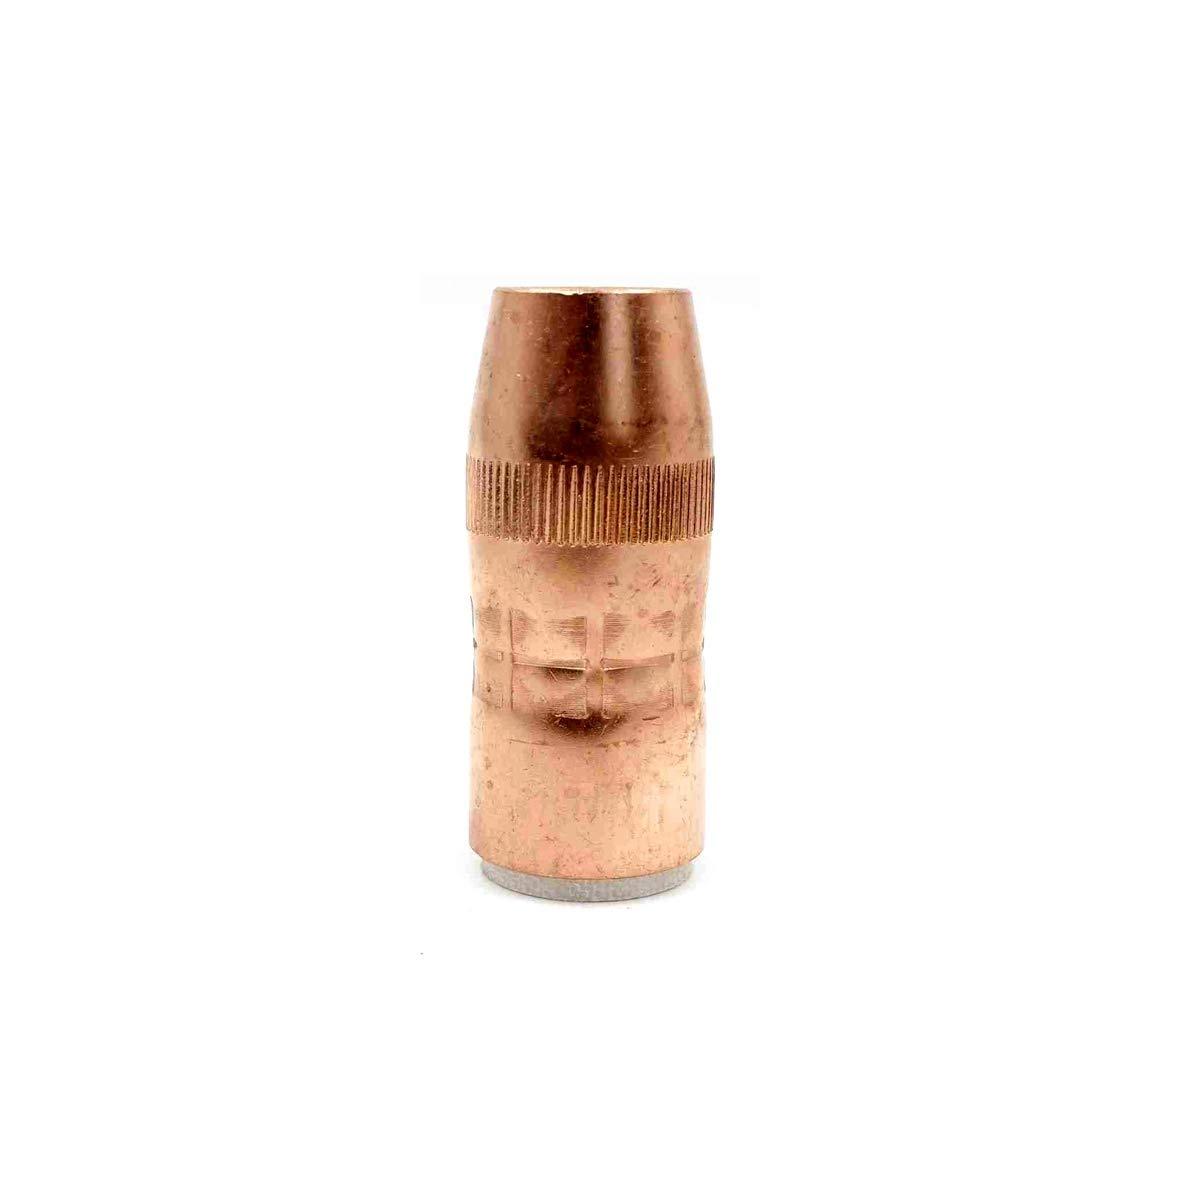 N-5818C Gas Nozzle 5//8 Bore 1//8 Recess for Bernard MIG Welding Torch Accessories pk//10